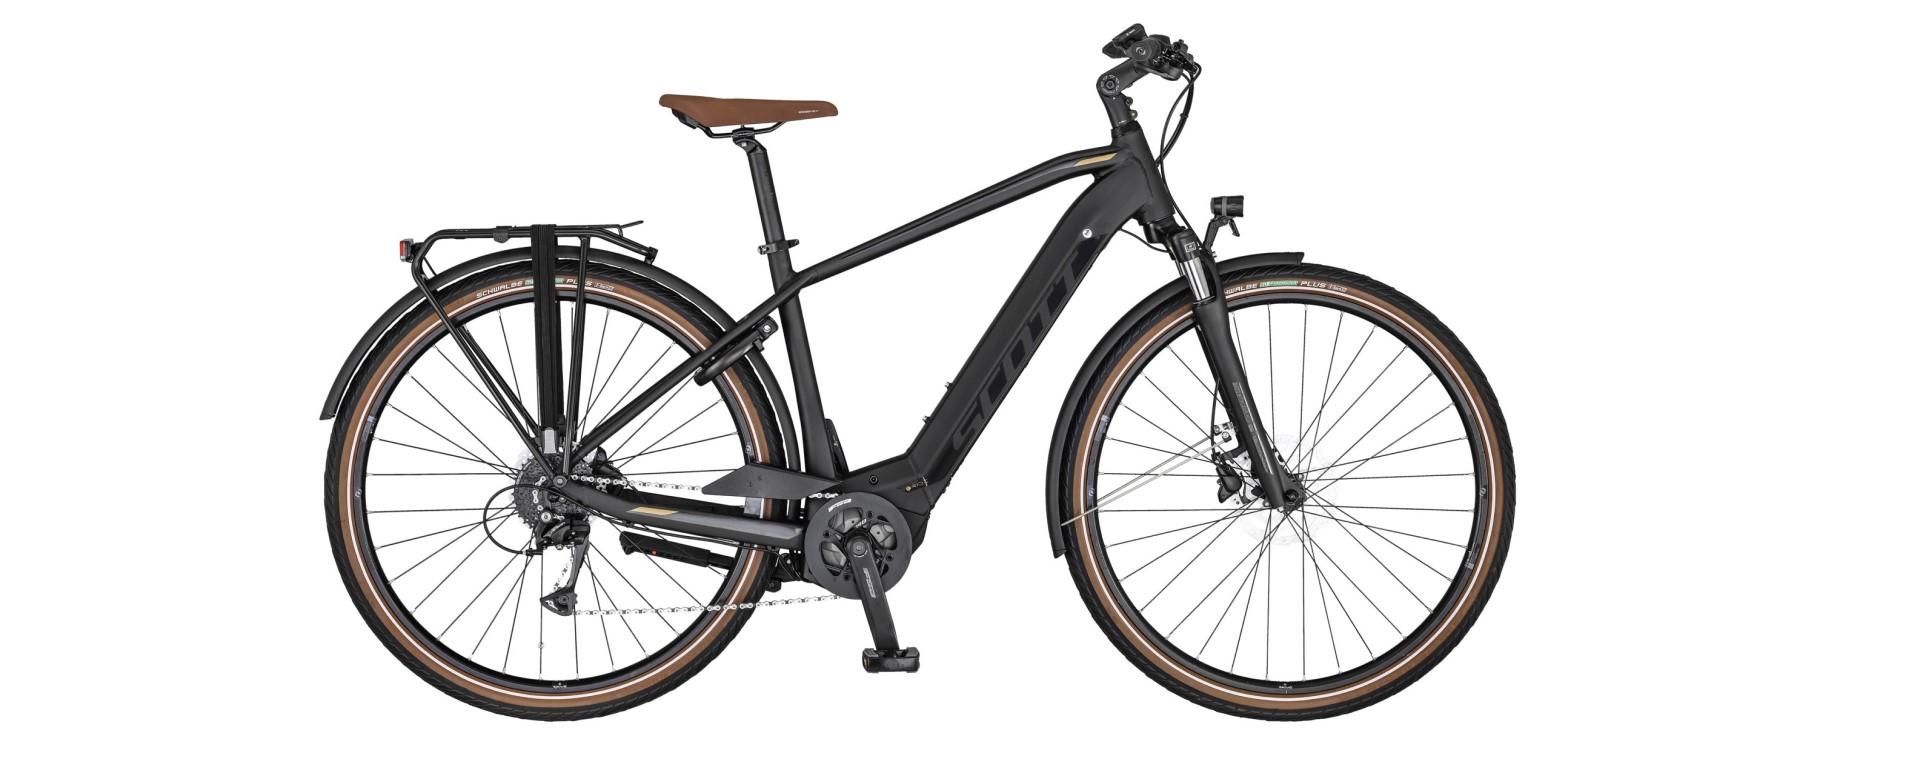 E bicikli za buducnost